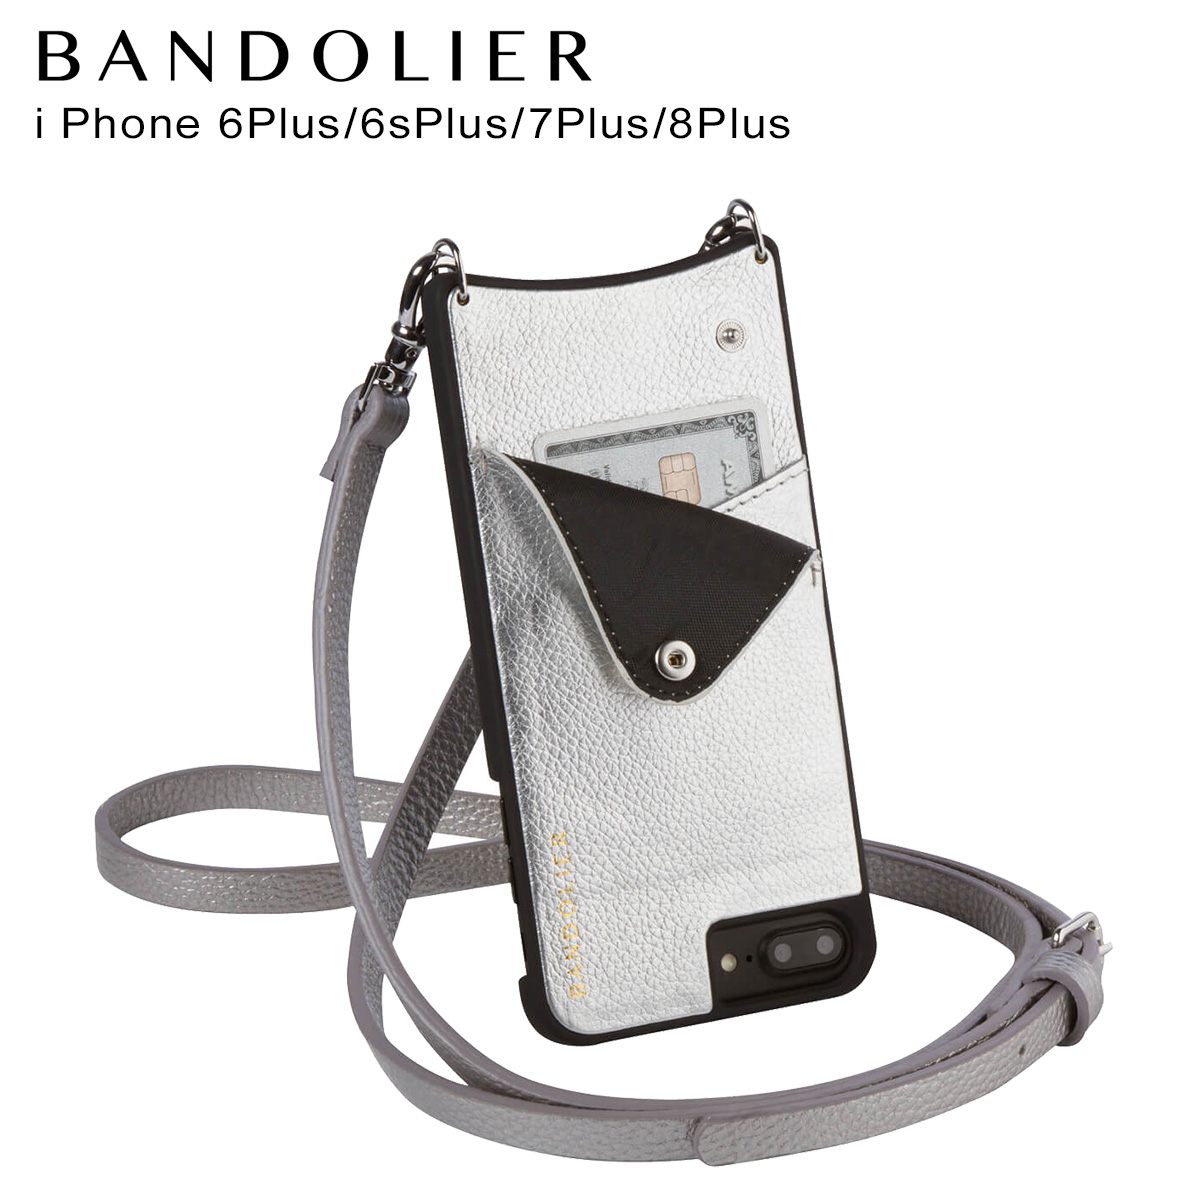 BANDOLIER iPhone8Plus iPhone7Plus 6sPlus EMMA RICH SILVER バンドリヤー ケース スマホ アイフォン プラス メンズ レディース